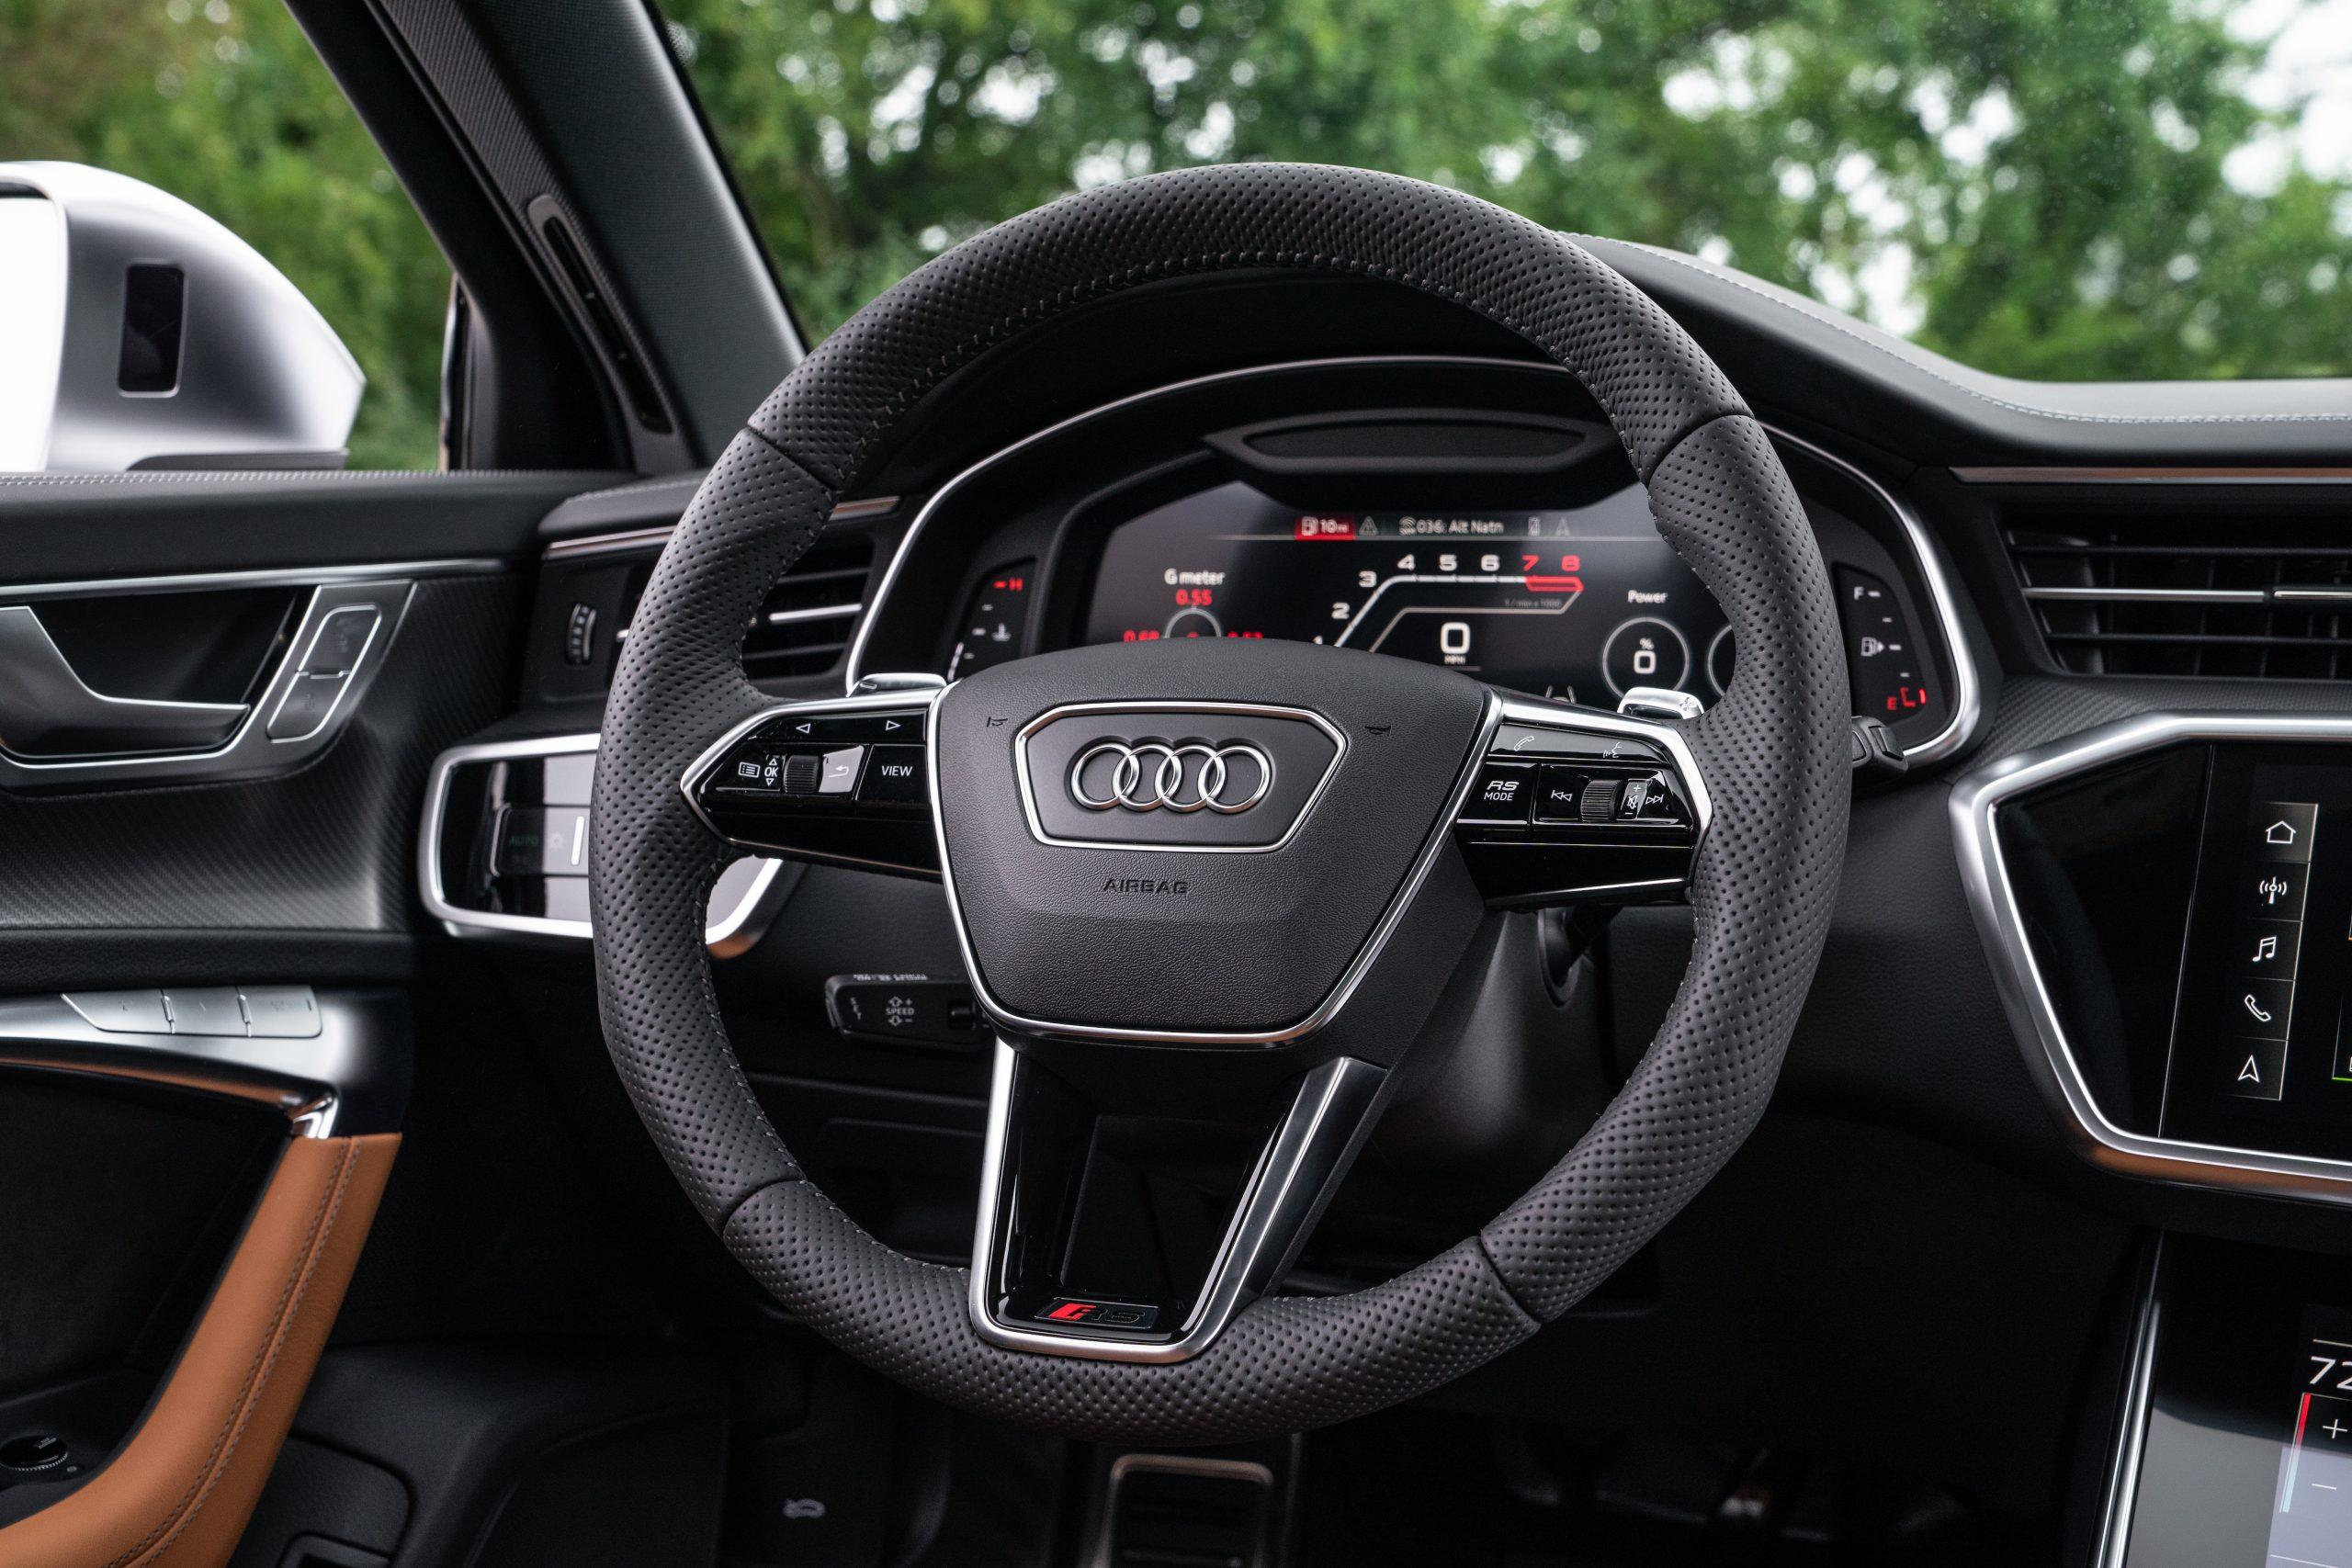 RS 6 Avant Nardo Gray interior steering wheel detail